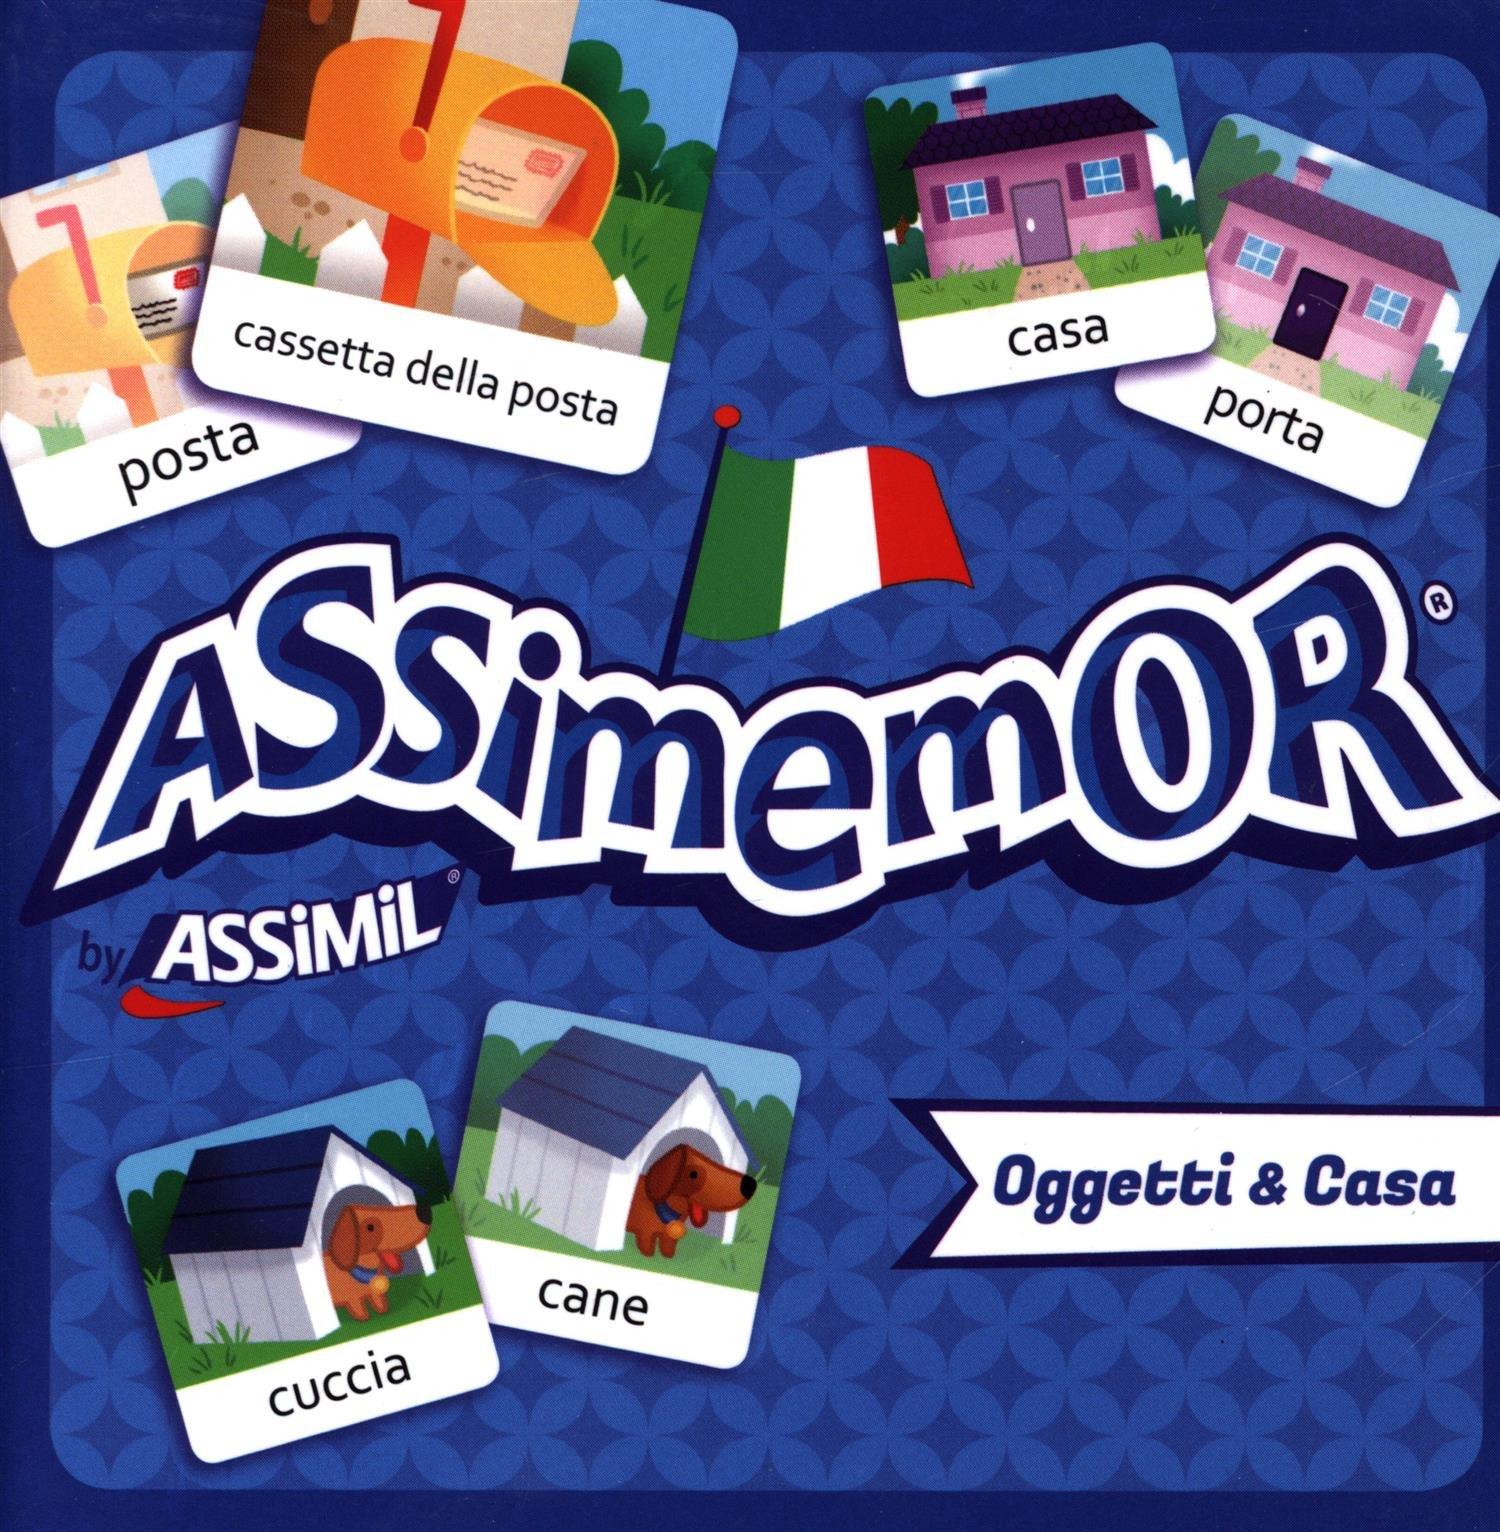 Assimemor Casa & Oggeti Cartonné – 22 septembre 2016 Collectif Assimil 2700590457 Età: a partire dai 5 anni